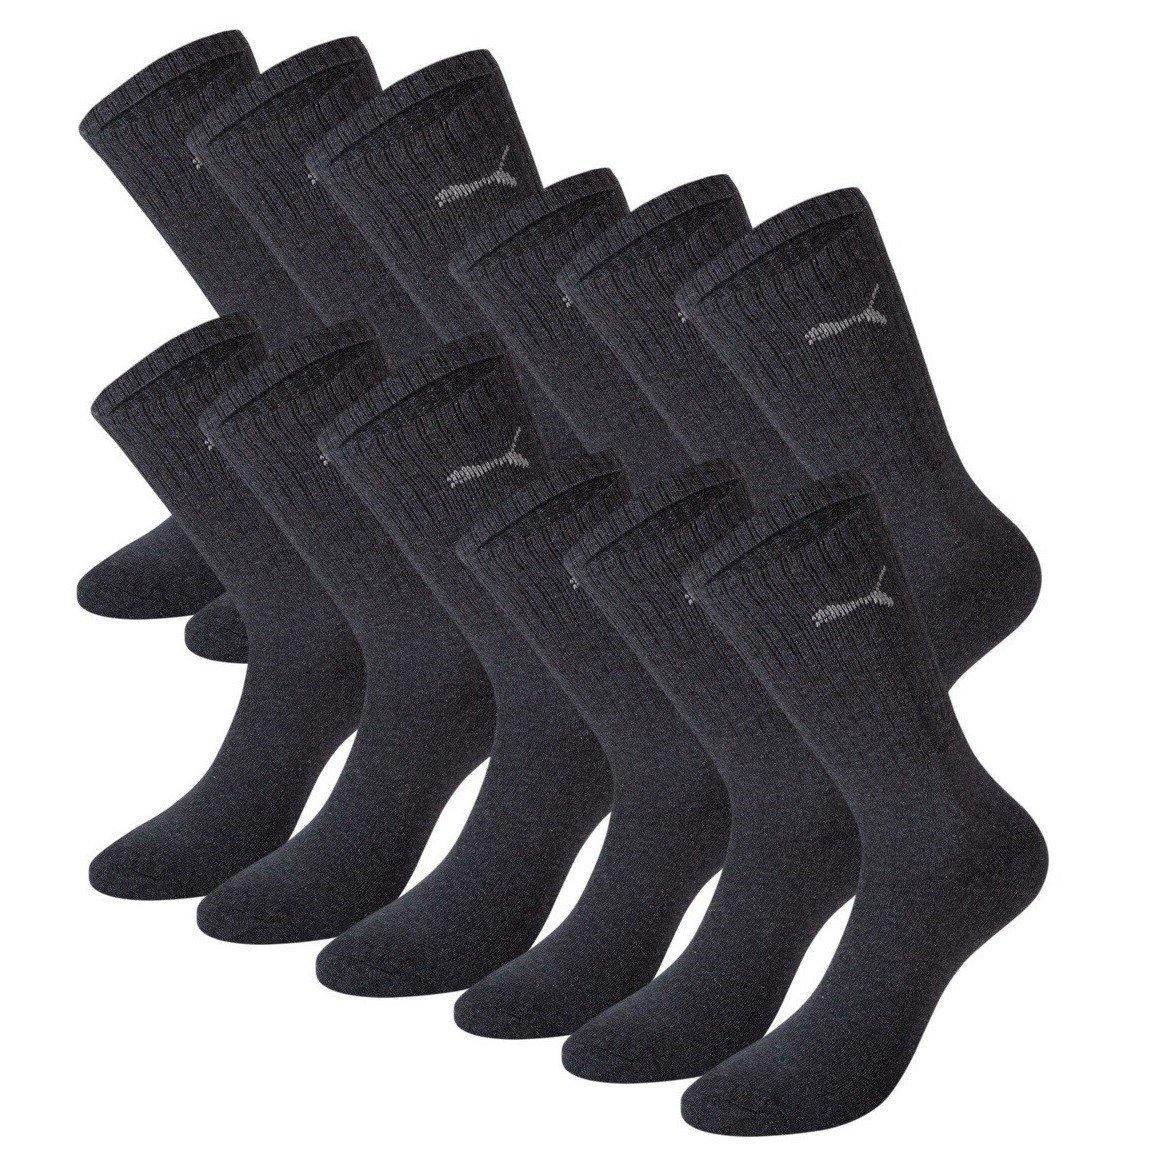 12P Calcetines deportivos unisex color gris Puma talla 43-46